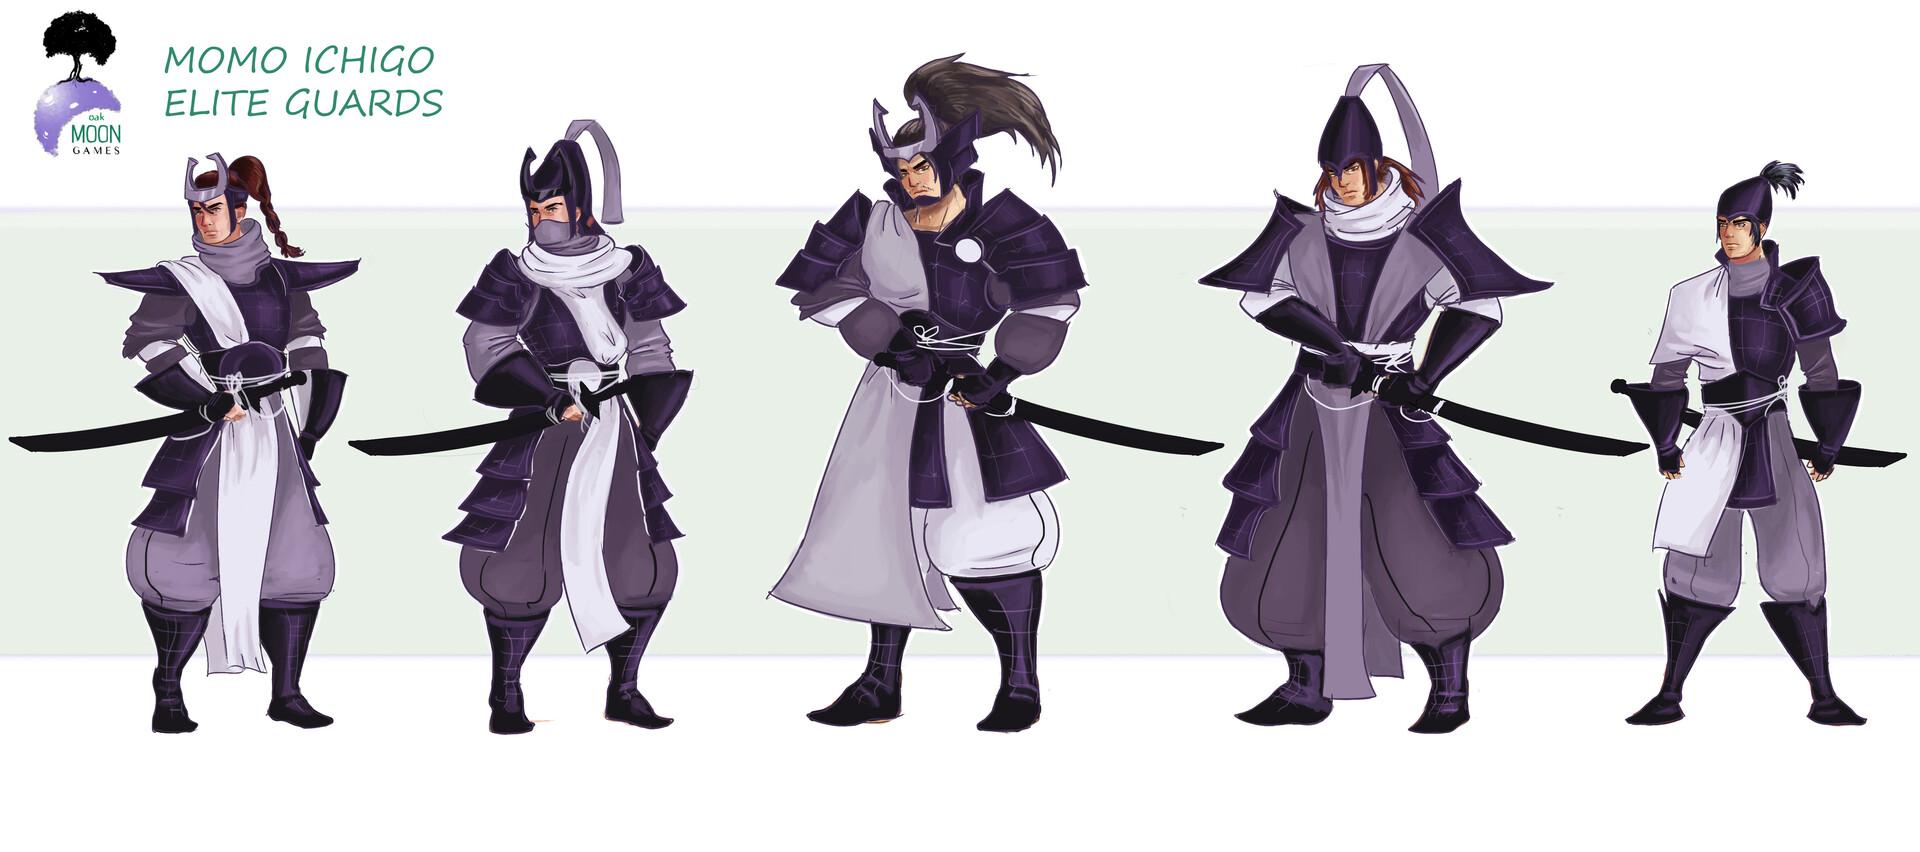 Elite Guard final designs